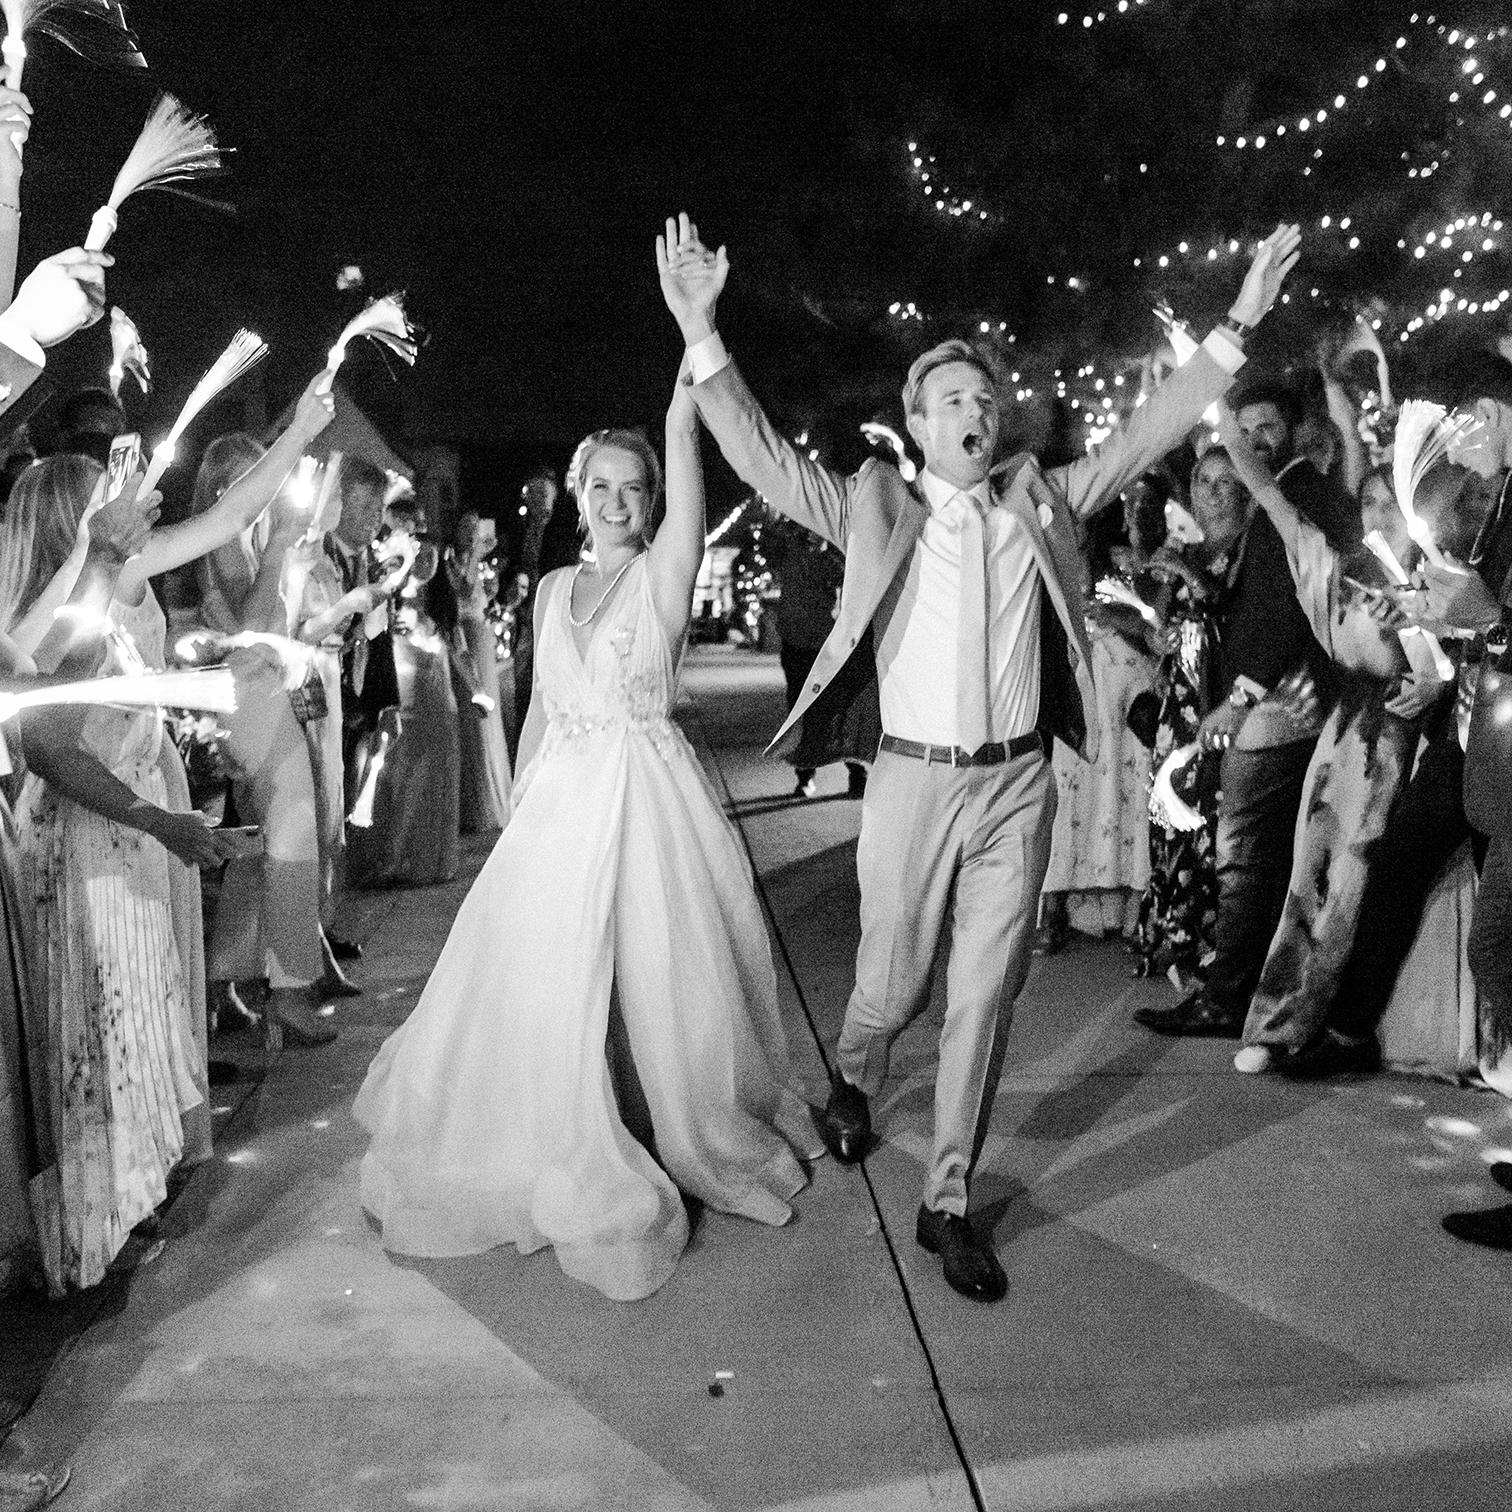 Colorado Wedding Photographers, Epic Exit Photos, Black and White, Destination Weddings, Denver Photographers